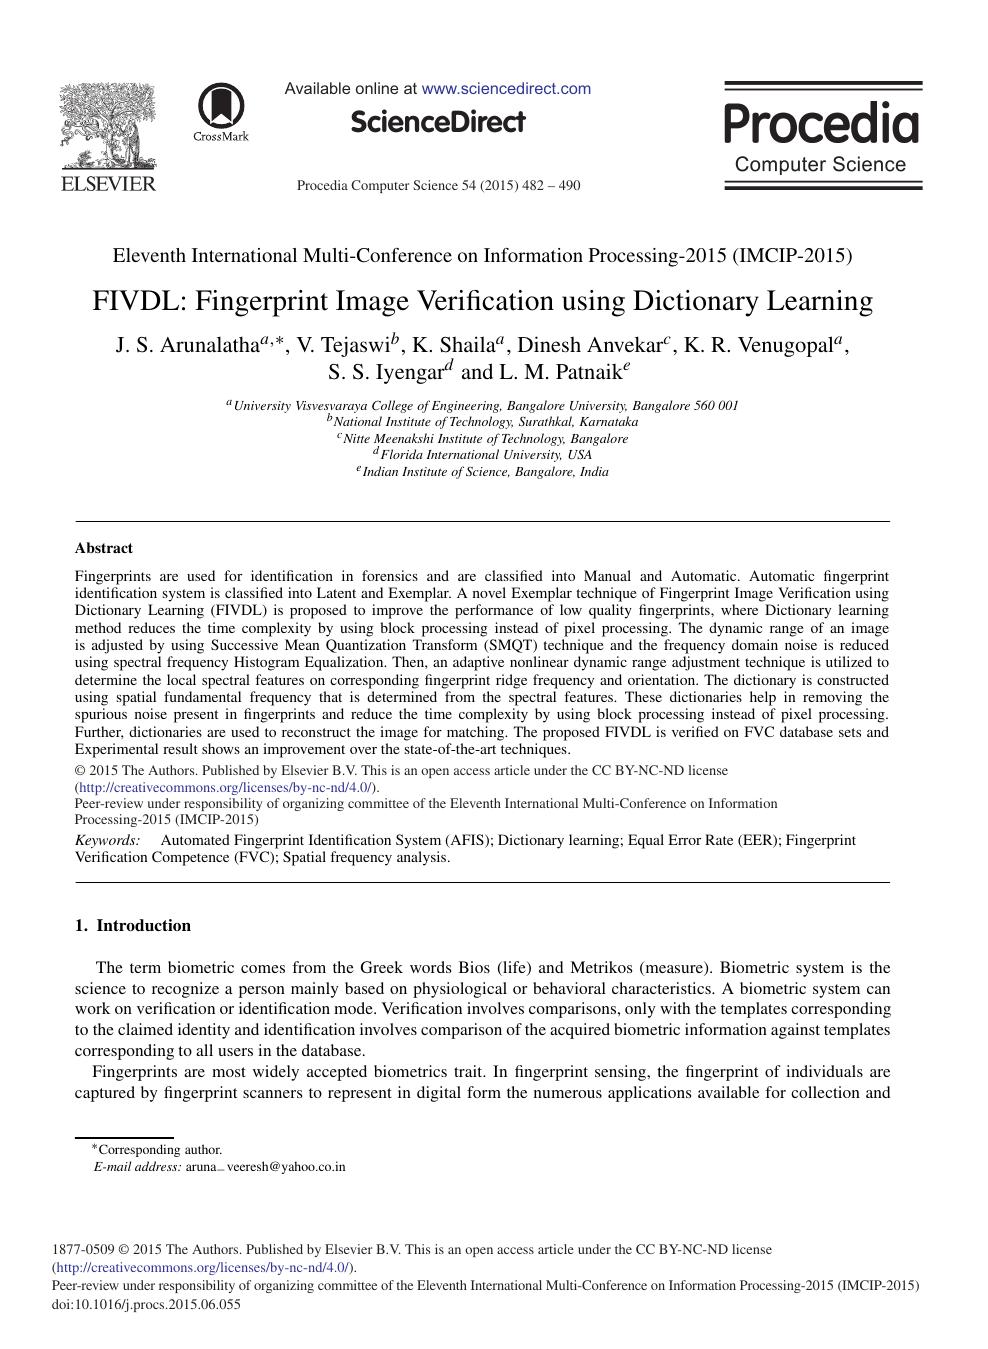 FIVDL: Fingerprint Image Verification using Dictionary